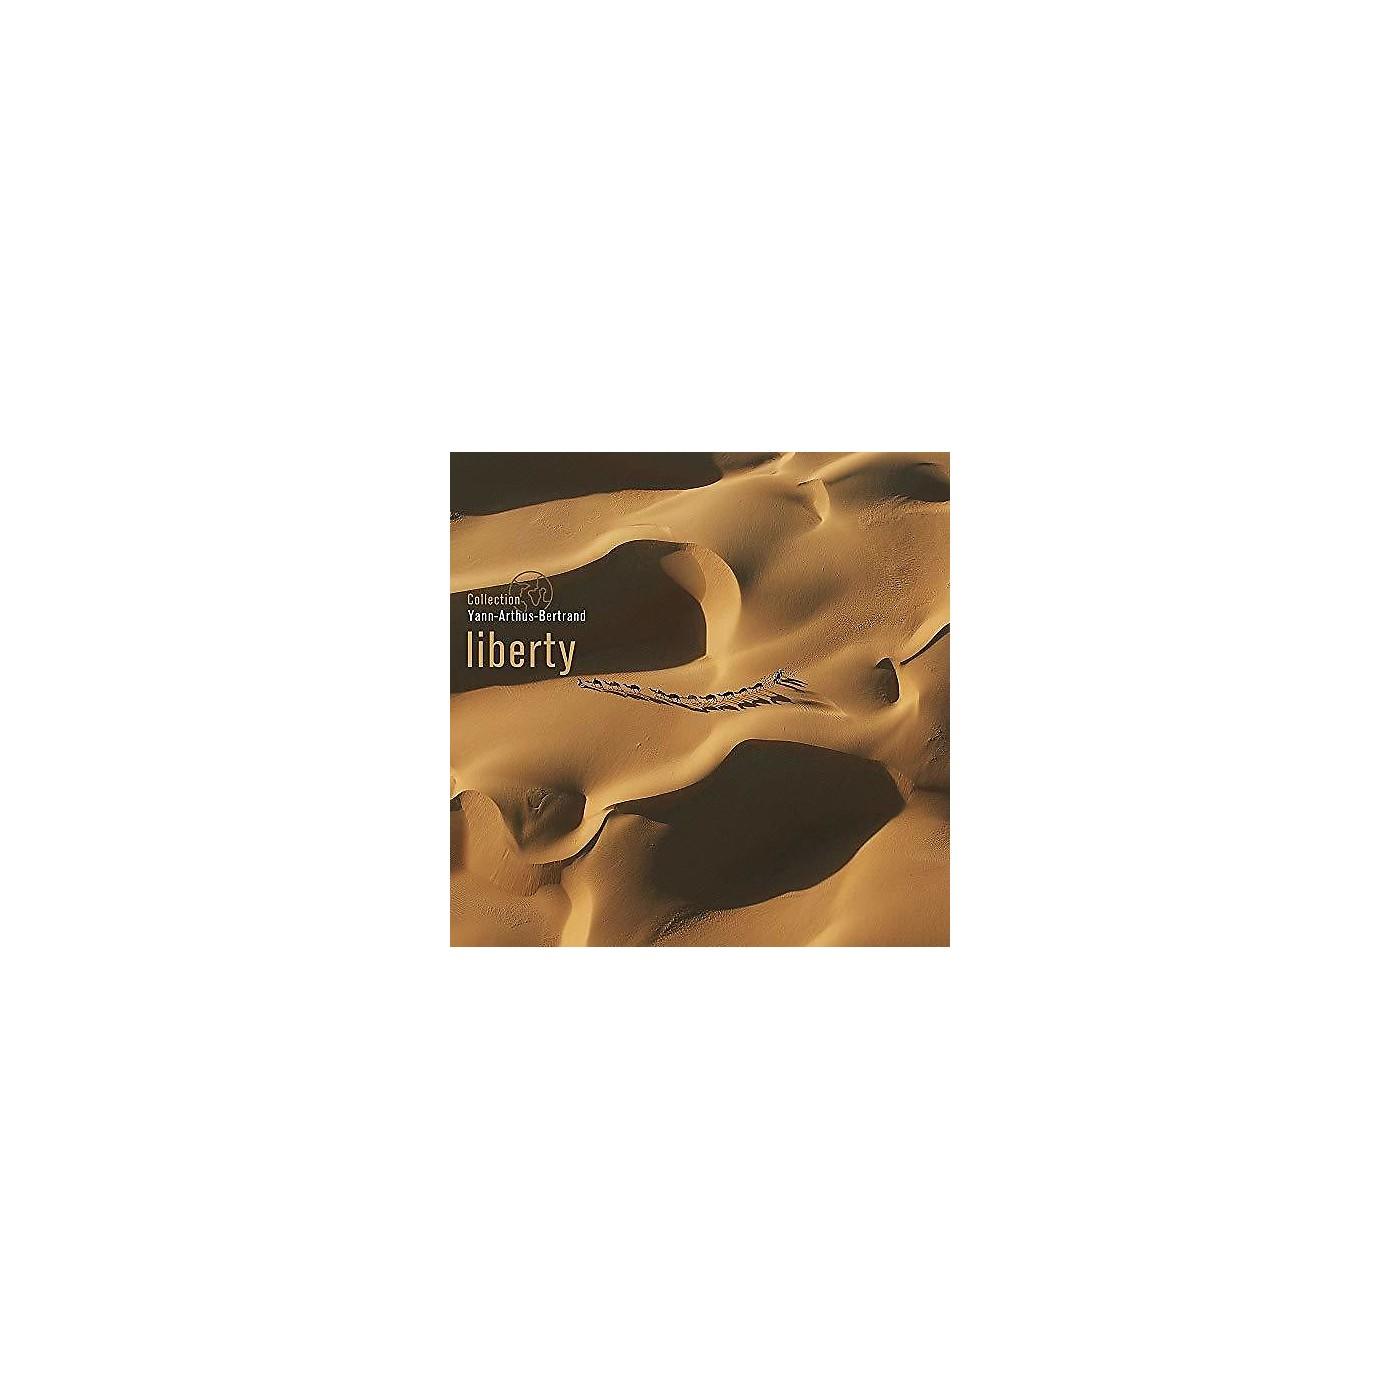 Alliance Collection Yann Arthus-Bertrand - Liberty thumbnail